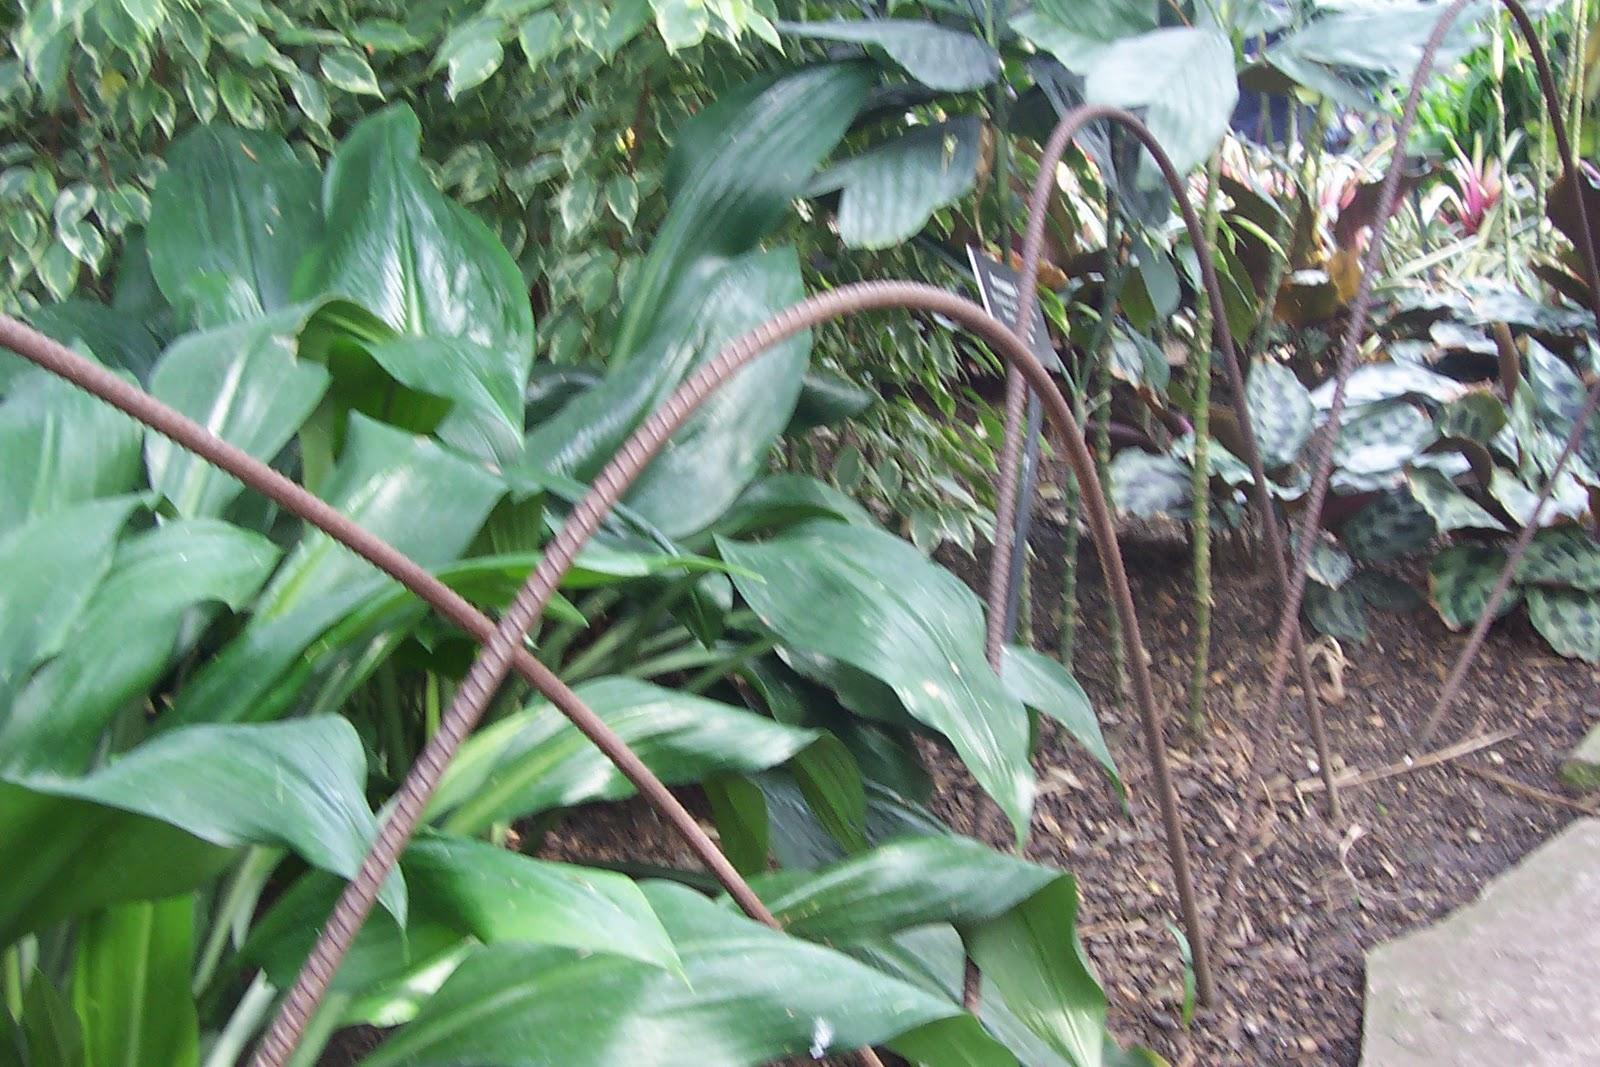 Wanda's Garden Adventures: Rebar Garden Craft Projects